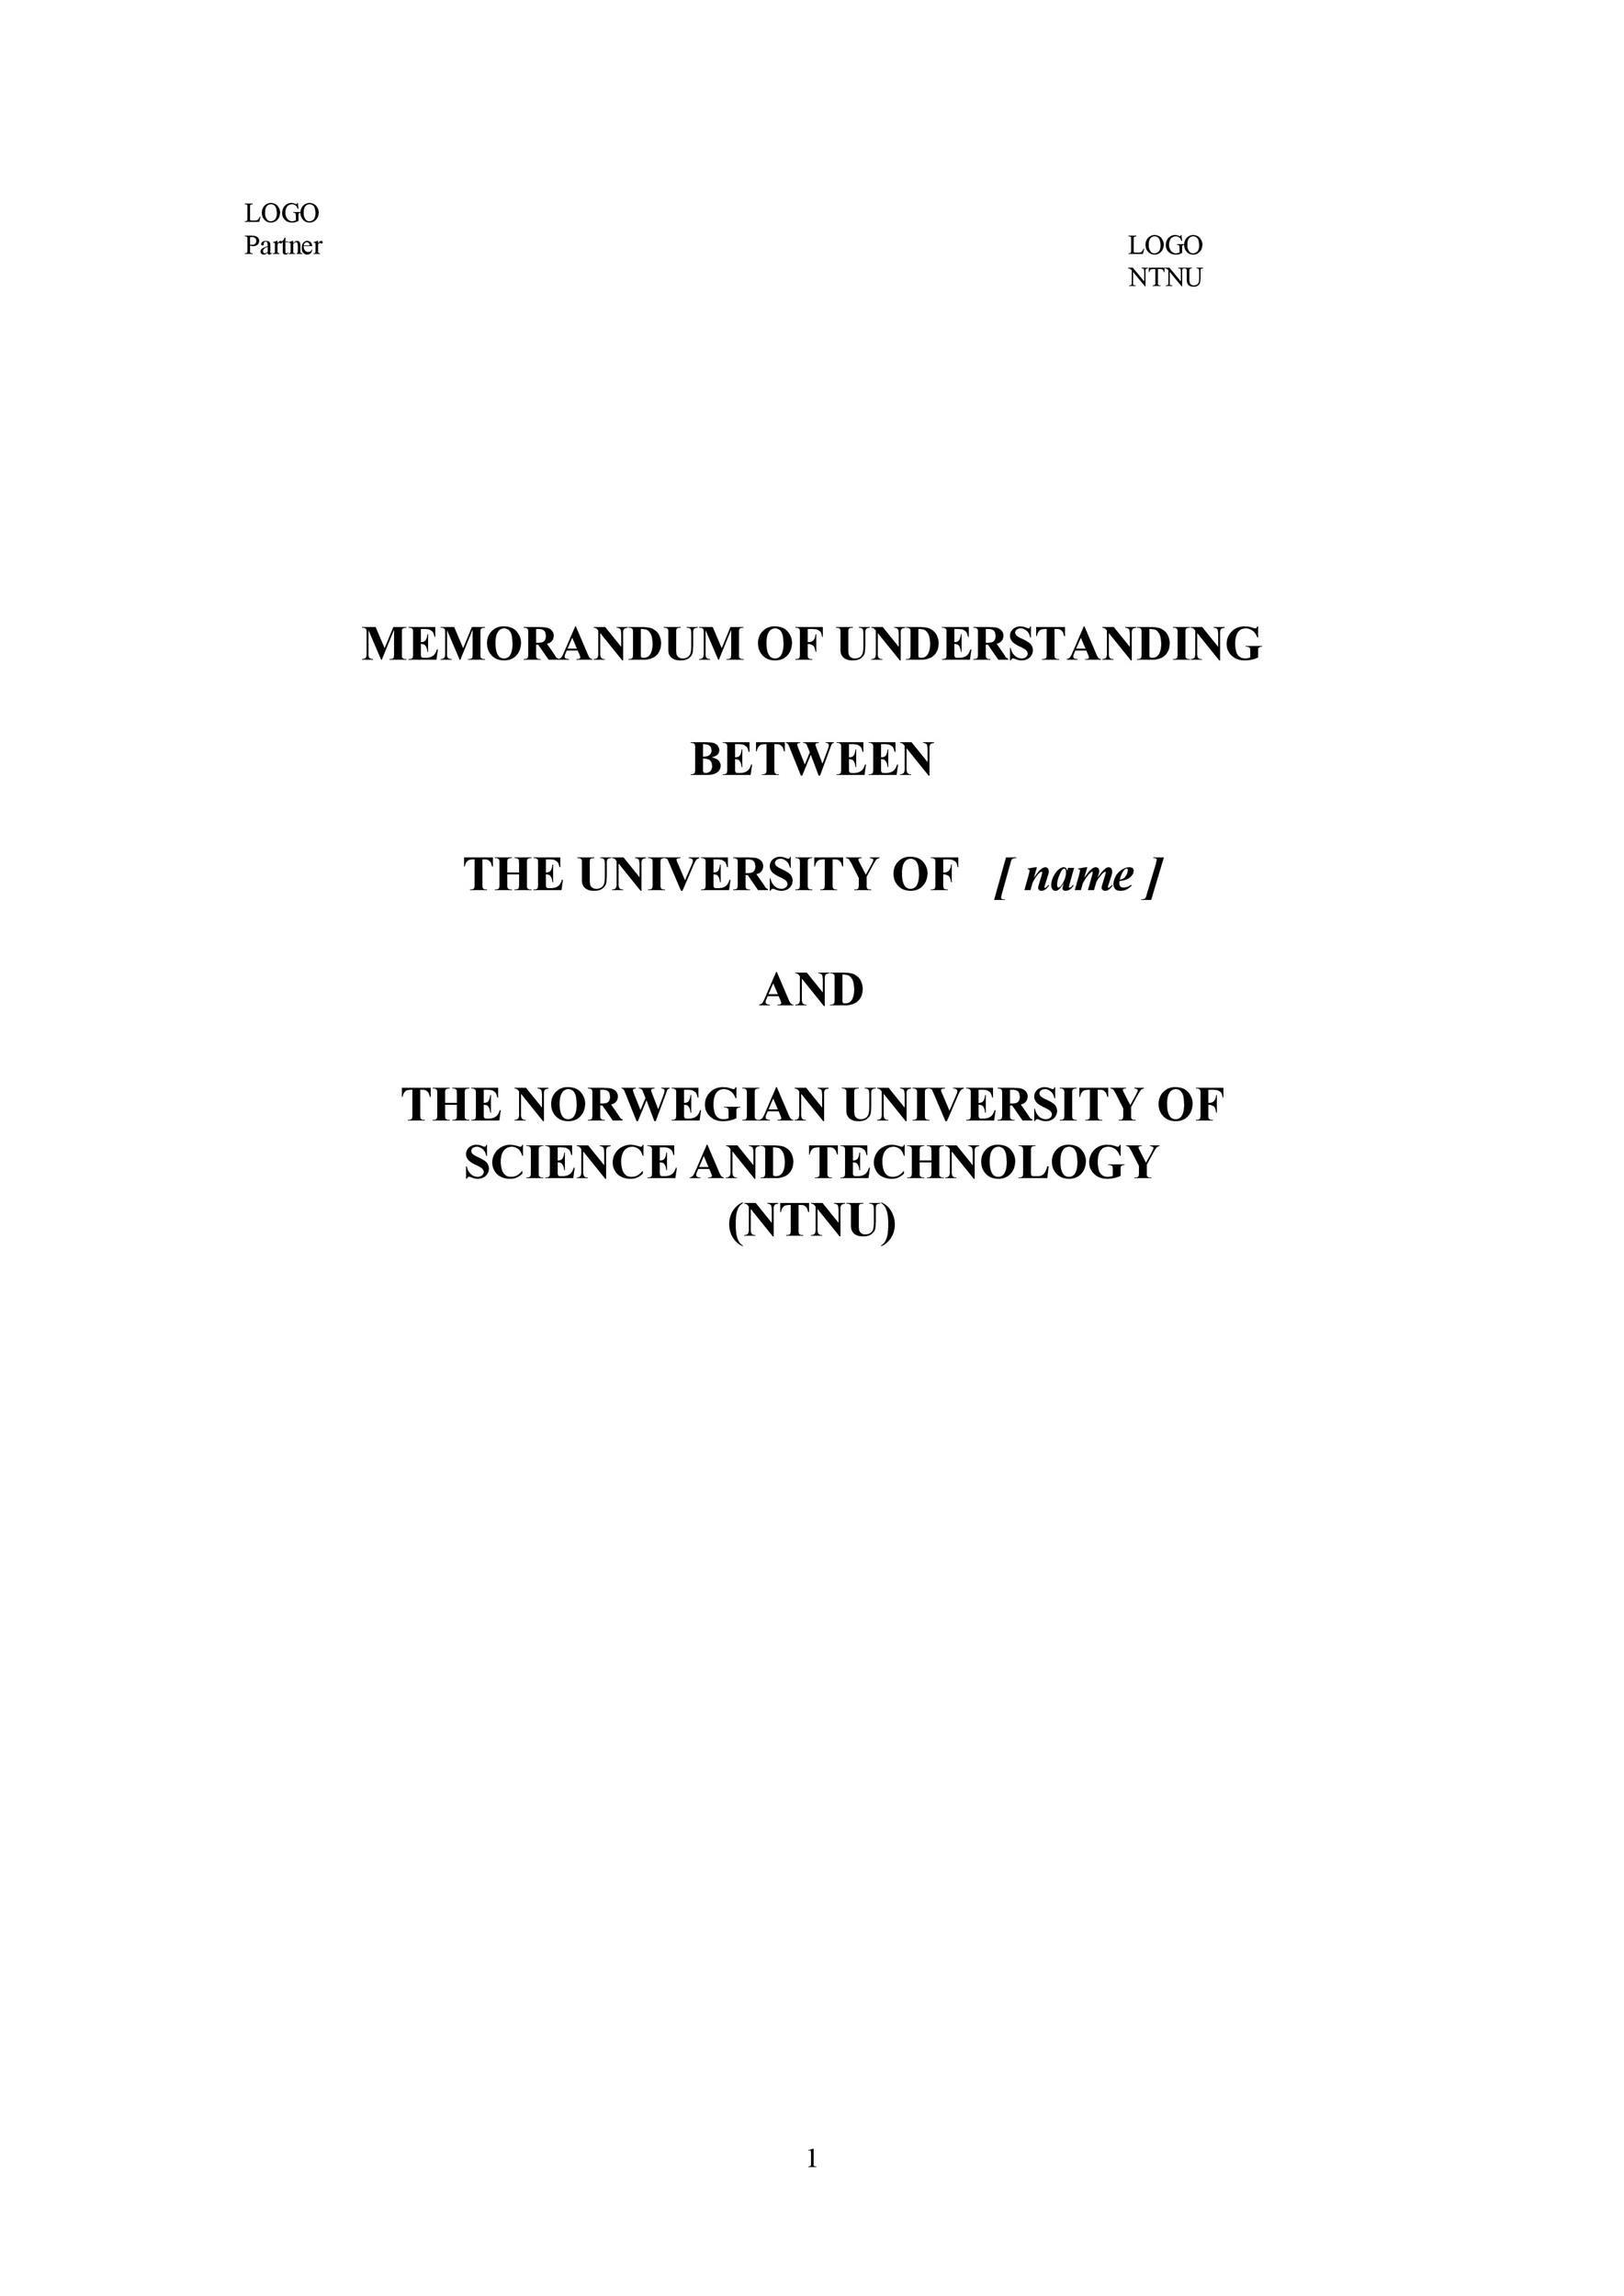 Free Memorandum of Understanding Template 35